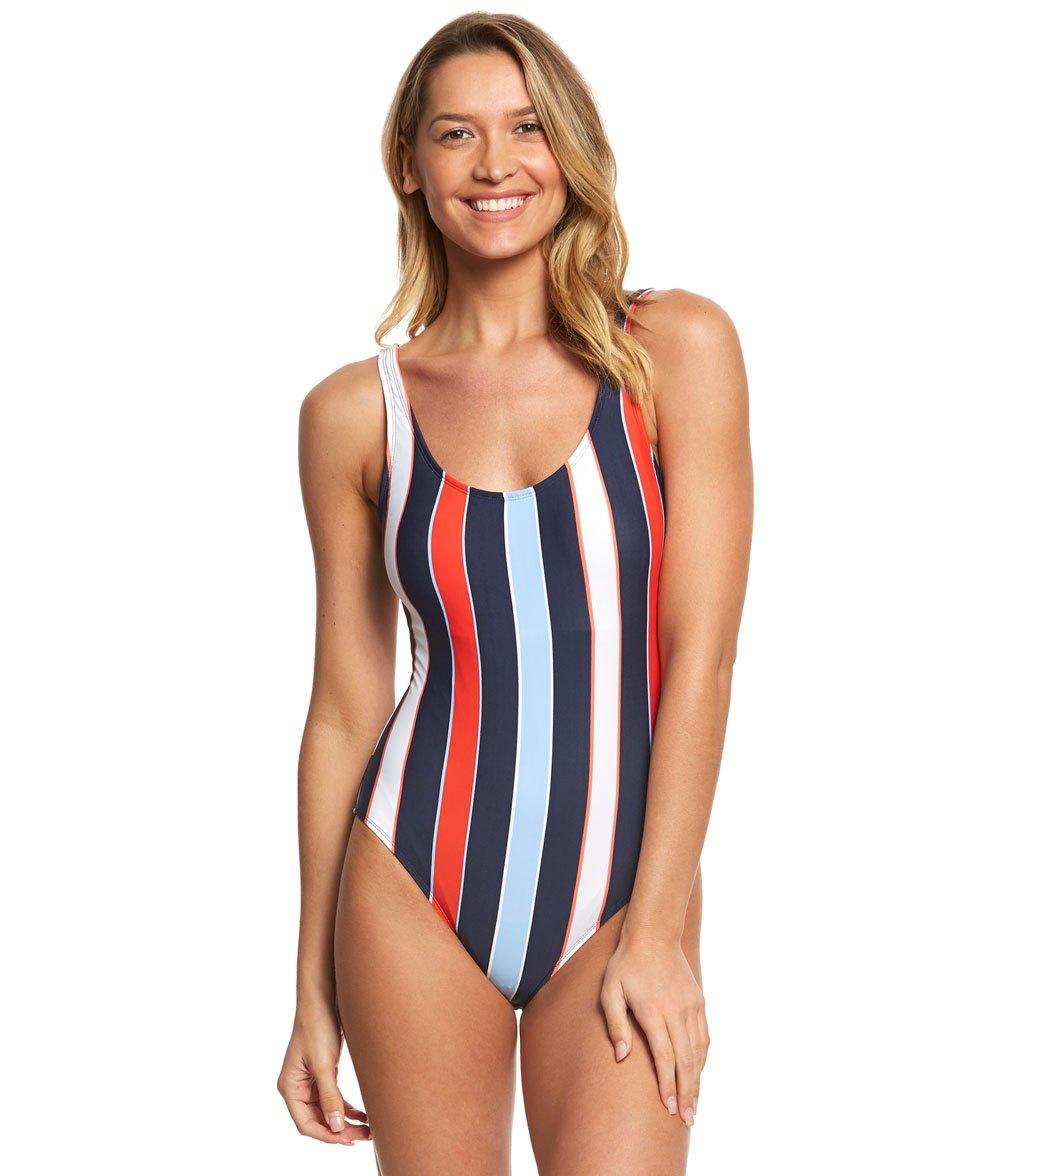 2e40dc52e4 Tommy Hilfiger Speedy Stripe Deep Scoop Neck One Piece Swimsuit ...